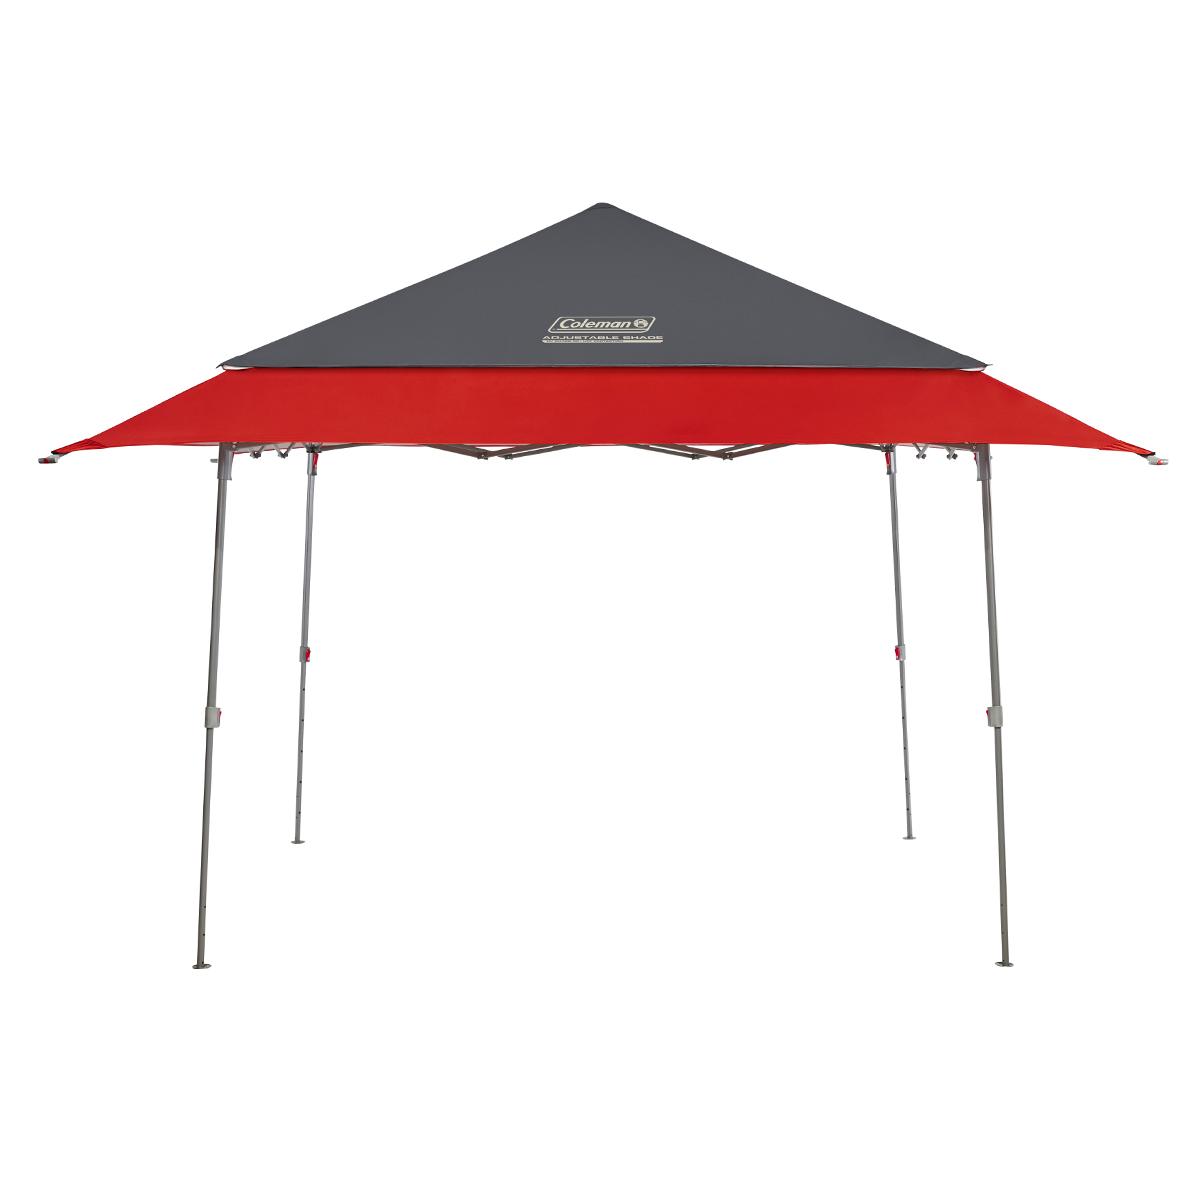 Coleman Expandable Shade Shelter $112  @ Walmart